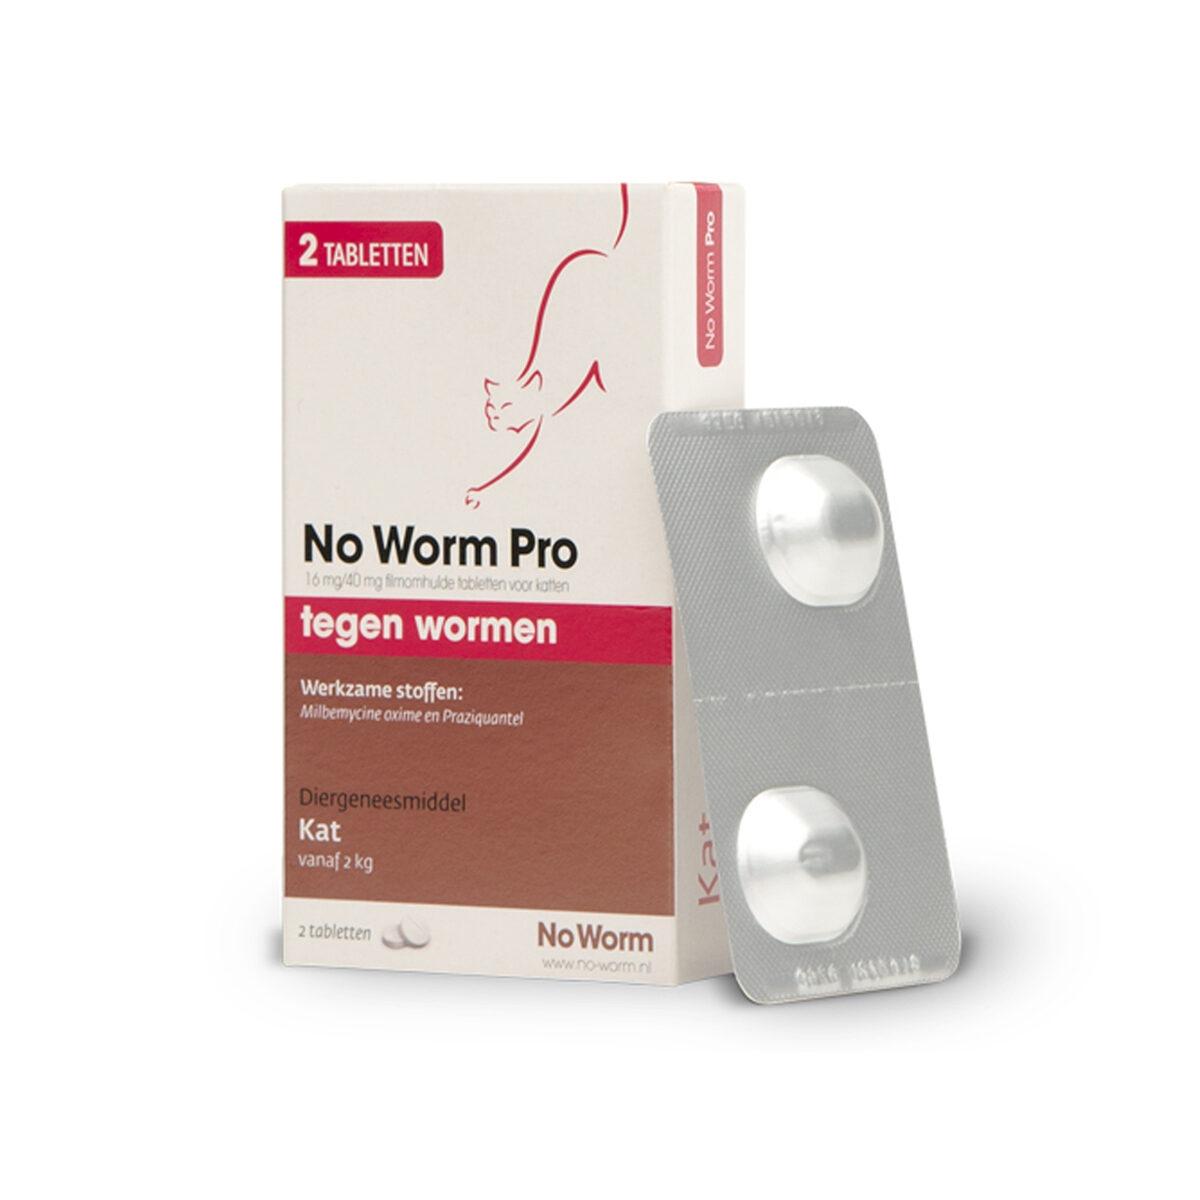 No Worm Pro 2 Tabletten Kat